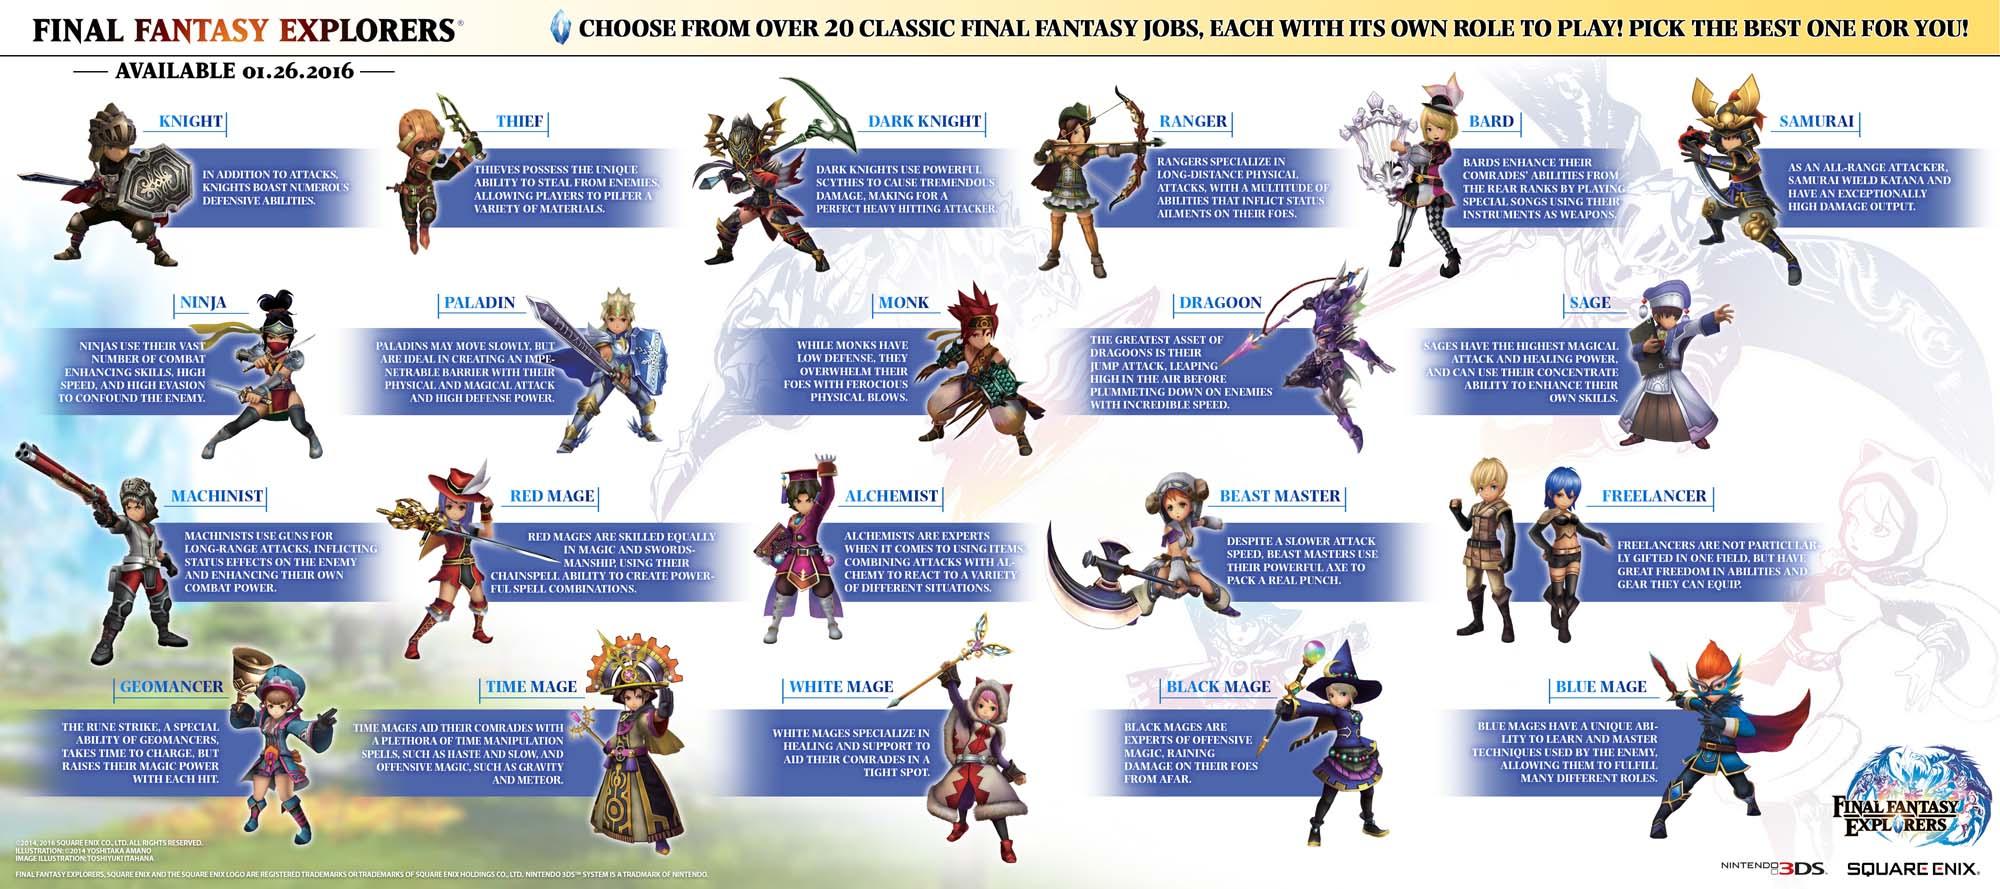 3DS Final Fantasy Explorers infographic